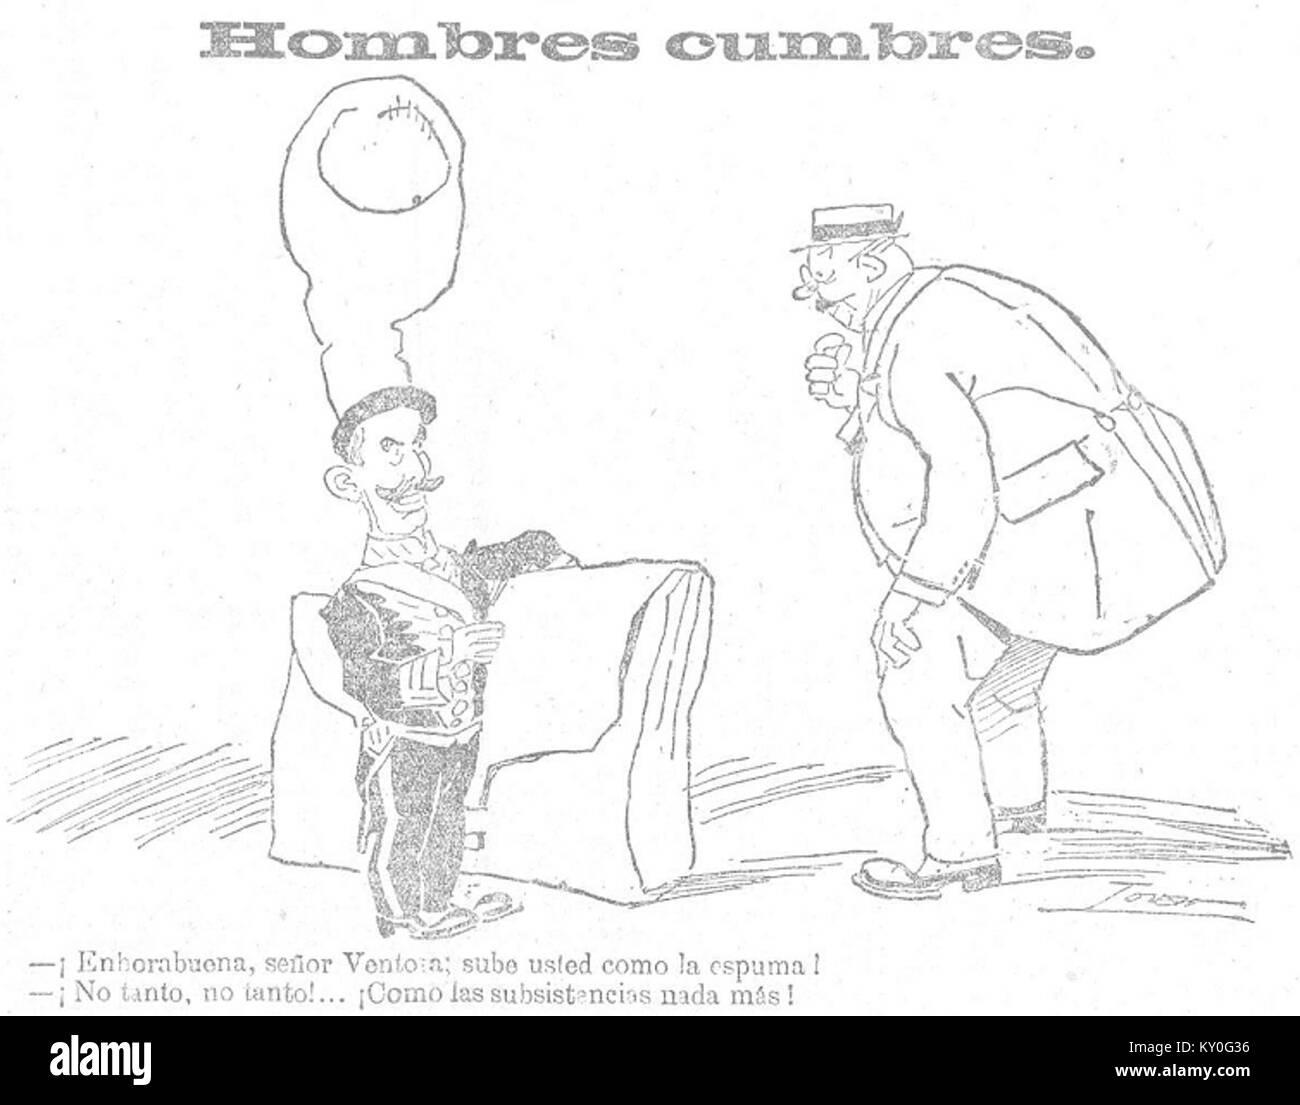 Hombres cumbres, de Tovar, Heraldo de Madrid, 6 de septiembre de 1918 - Stock Image